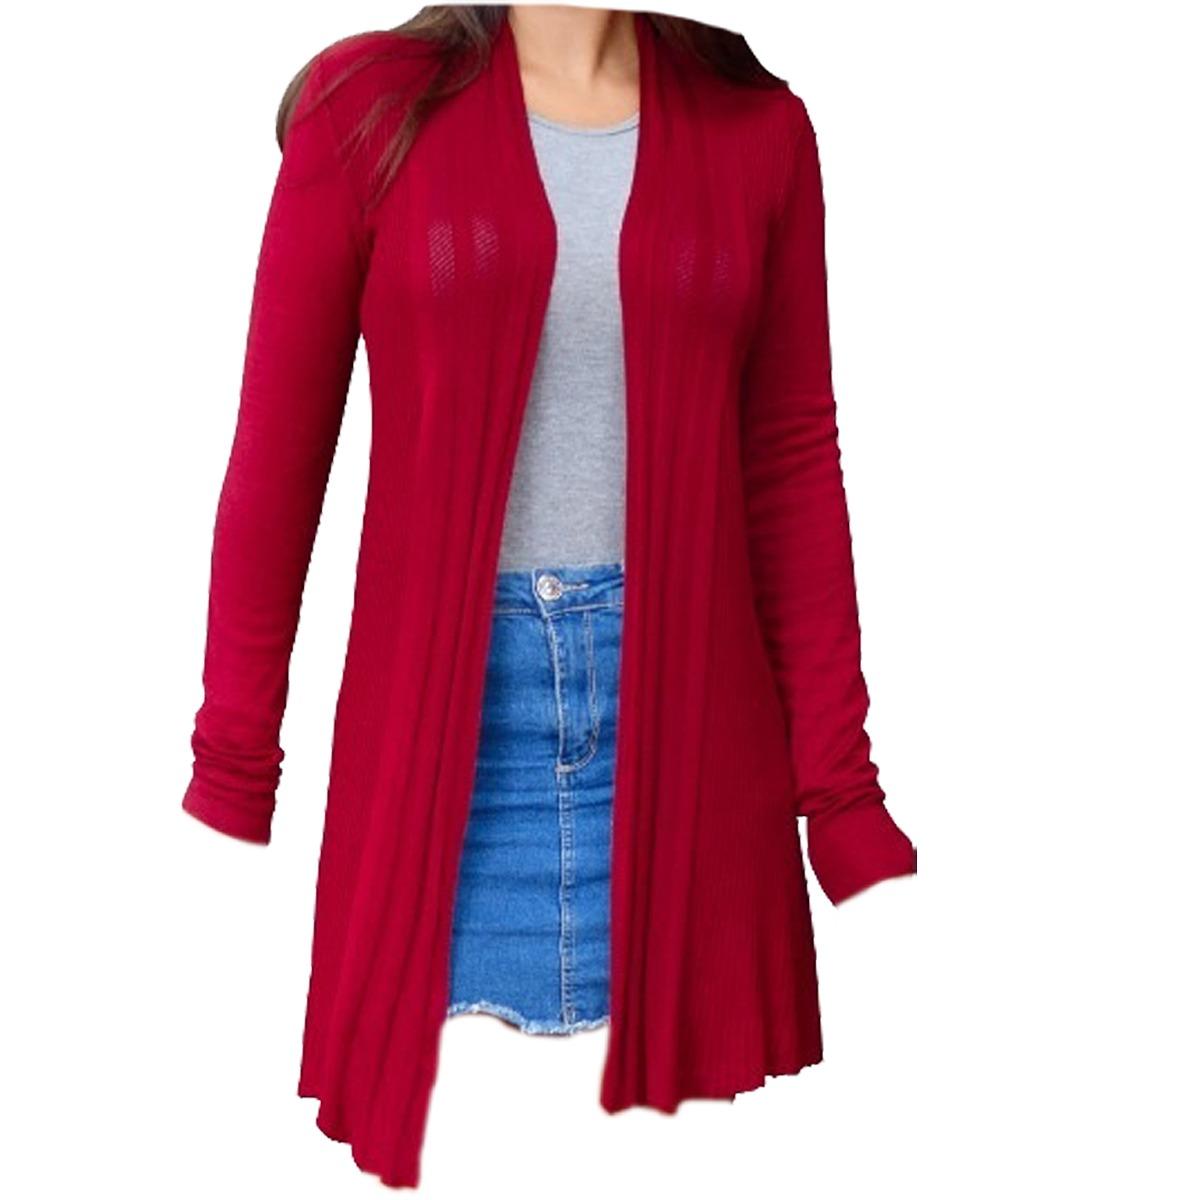 31d0d8df9 kimono cardigan blusa trico tricot la feminino inverno boho. Carregando zoom .